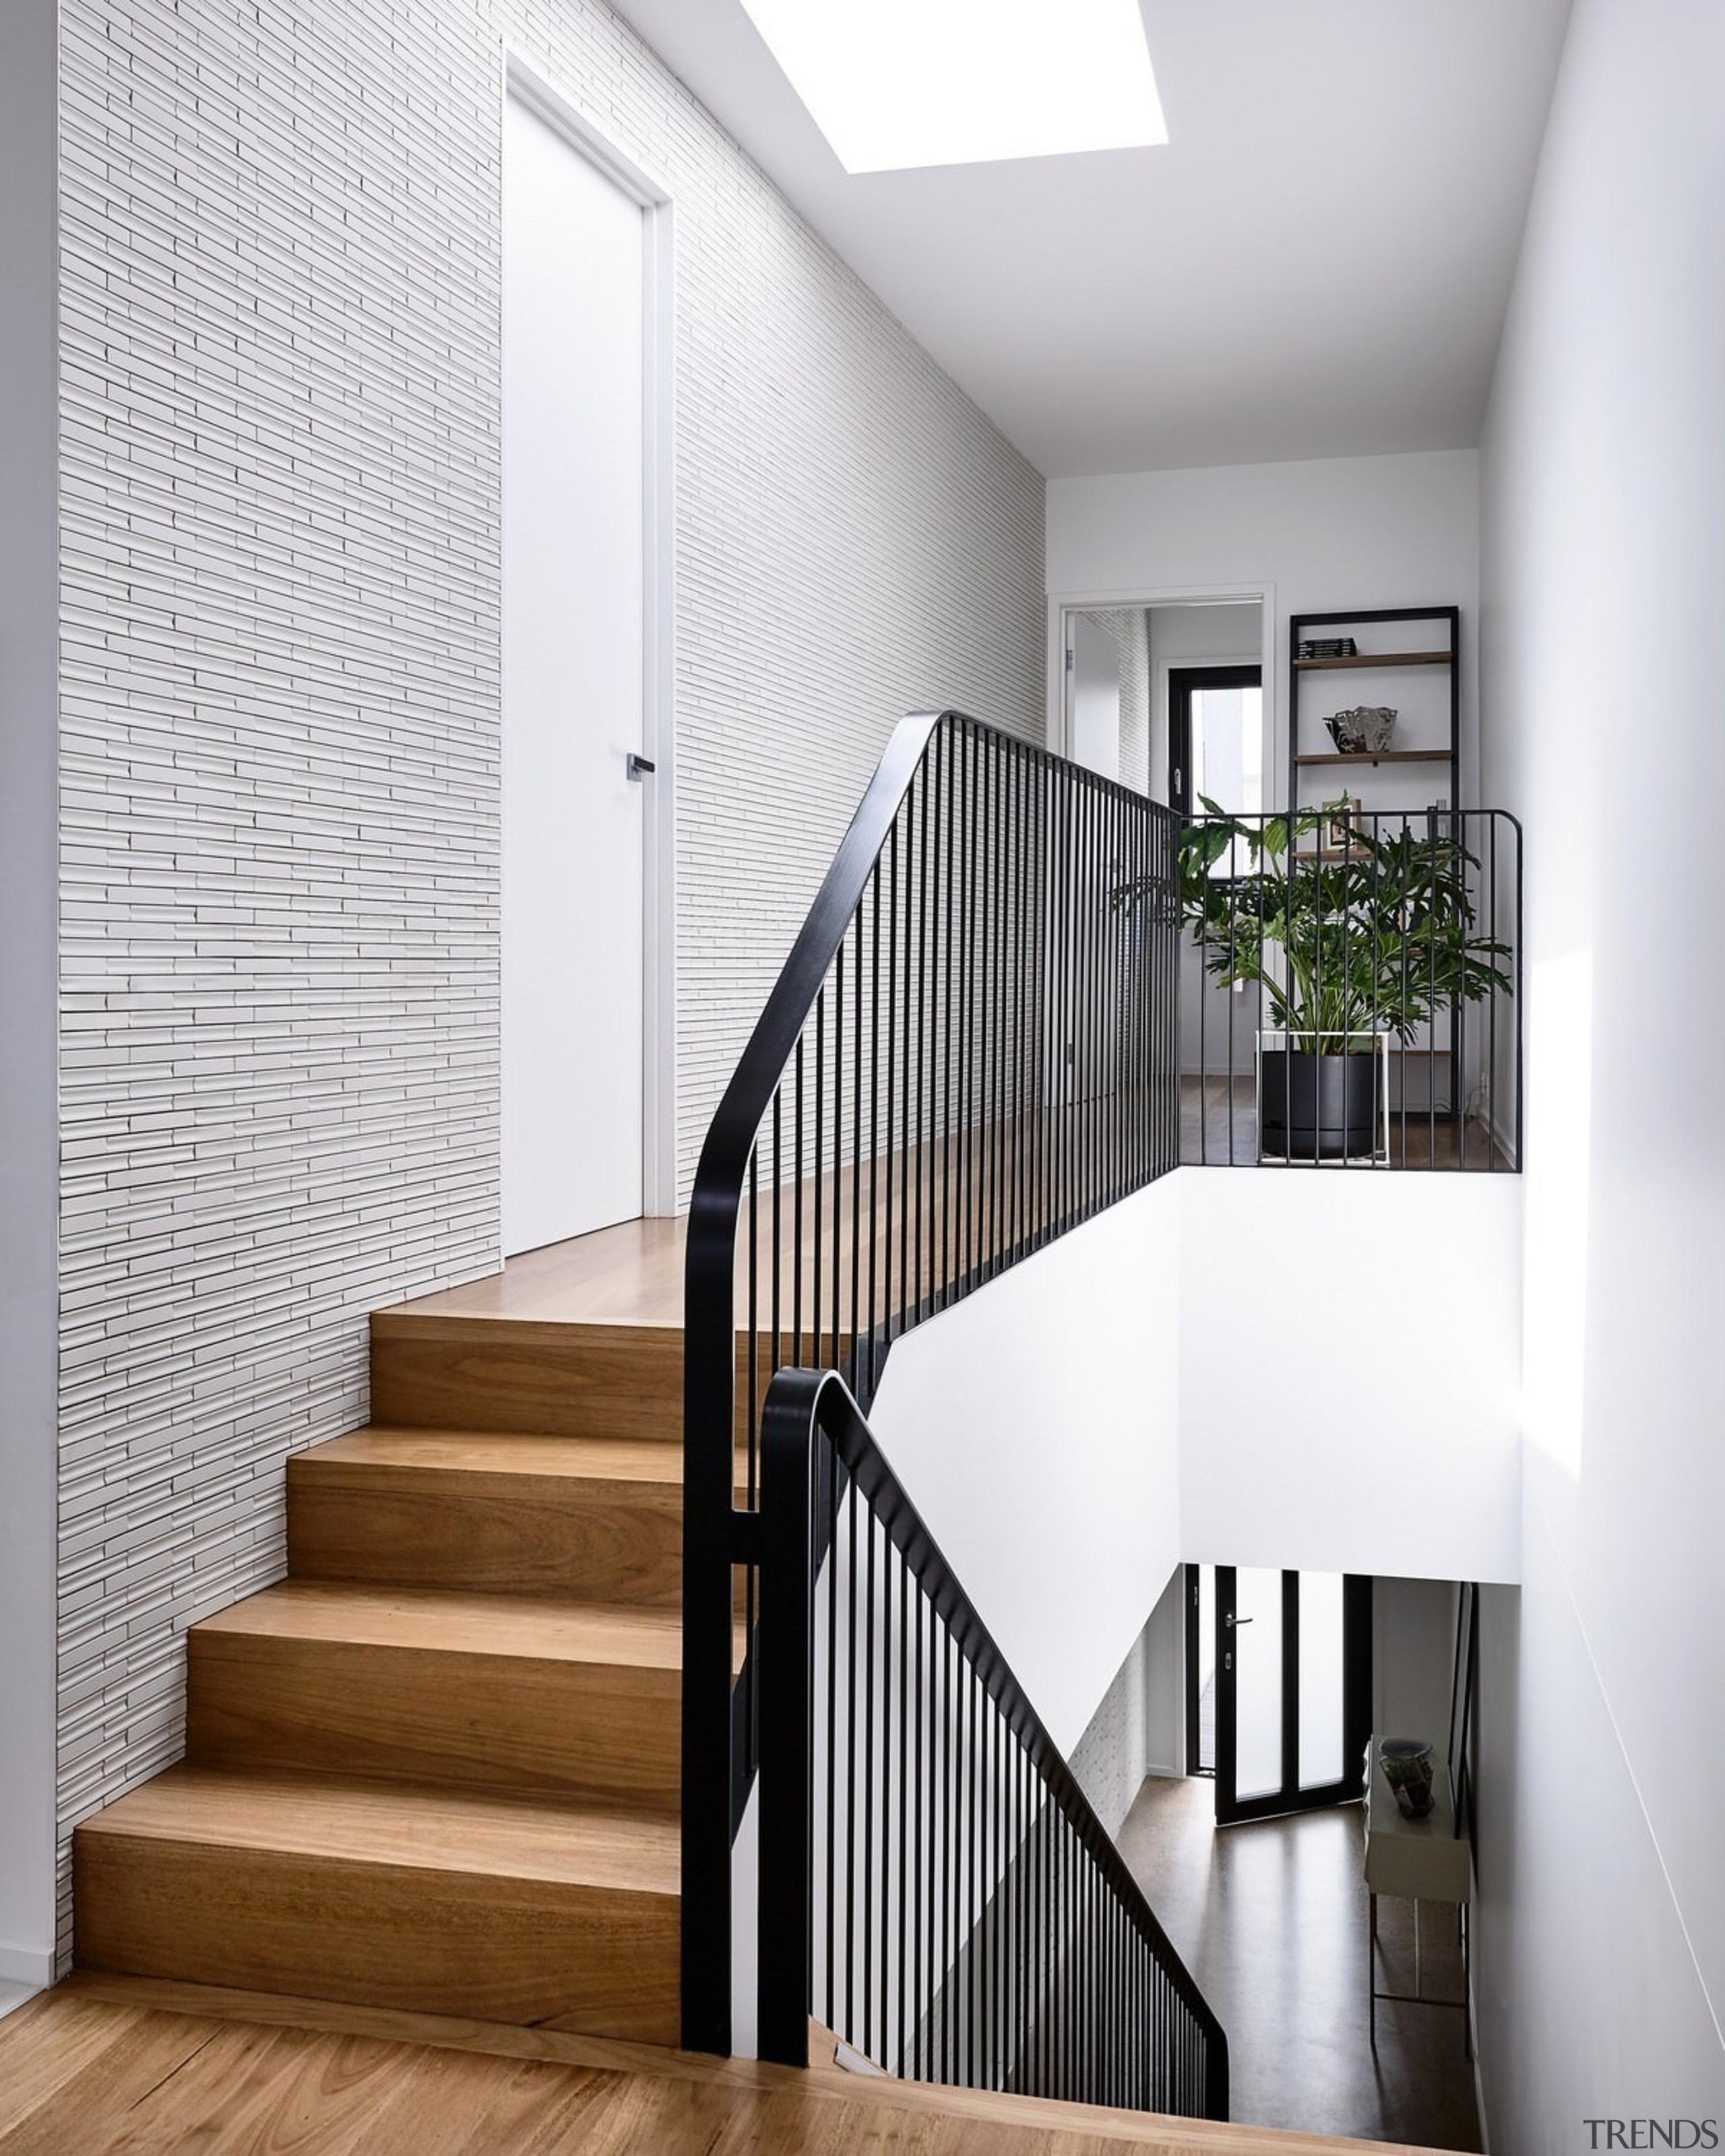 Black balustrades draw the eye - Black balustrades architecture, baluster, handrail, home, house, interior design, stairs, white